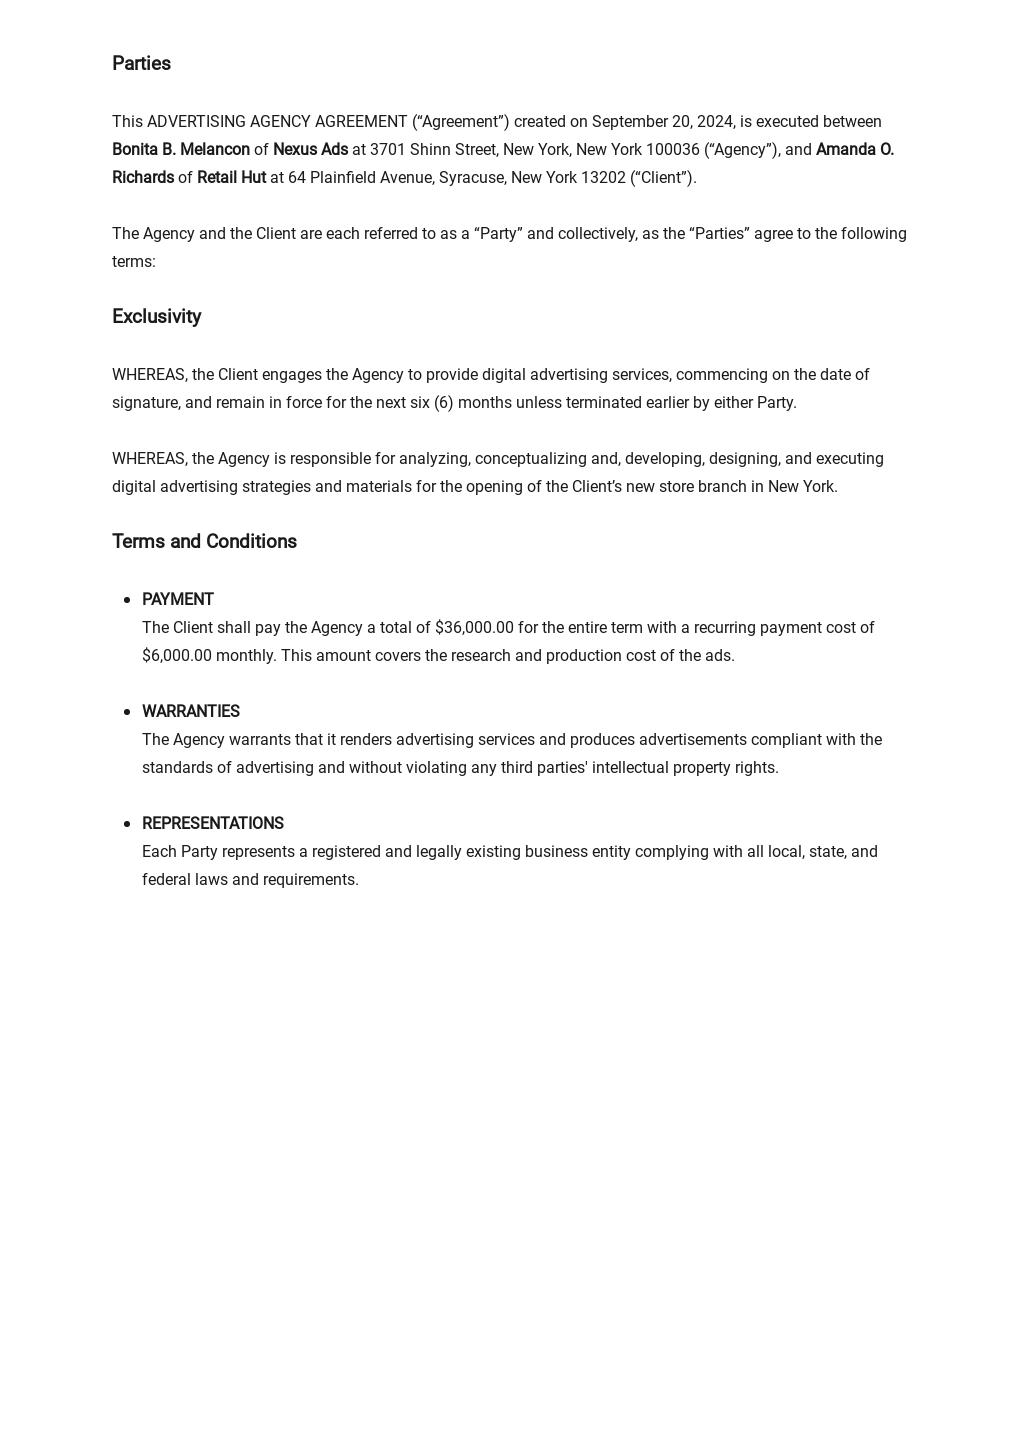 Free Sample Advertising Agency Agreement Template 1.jpe